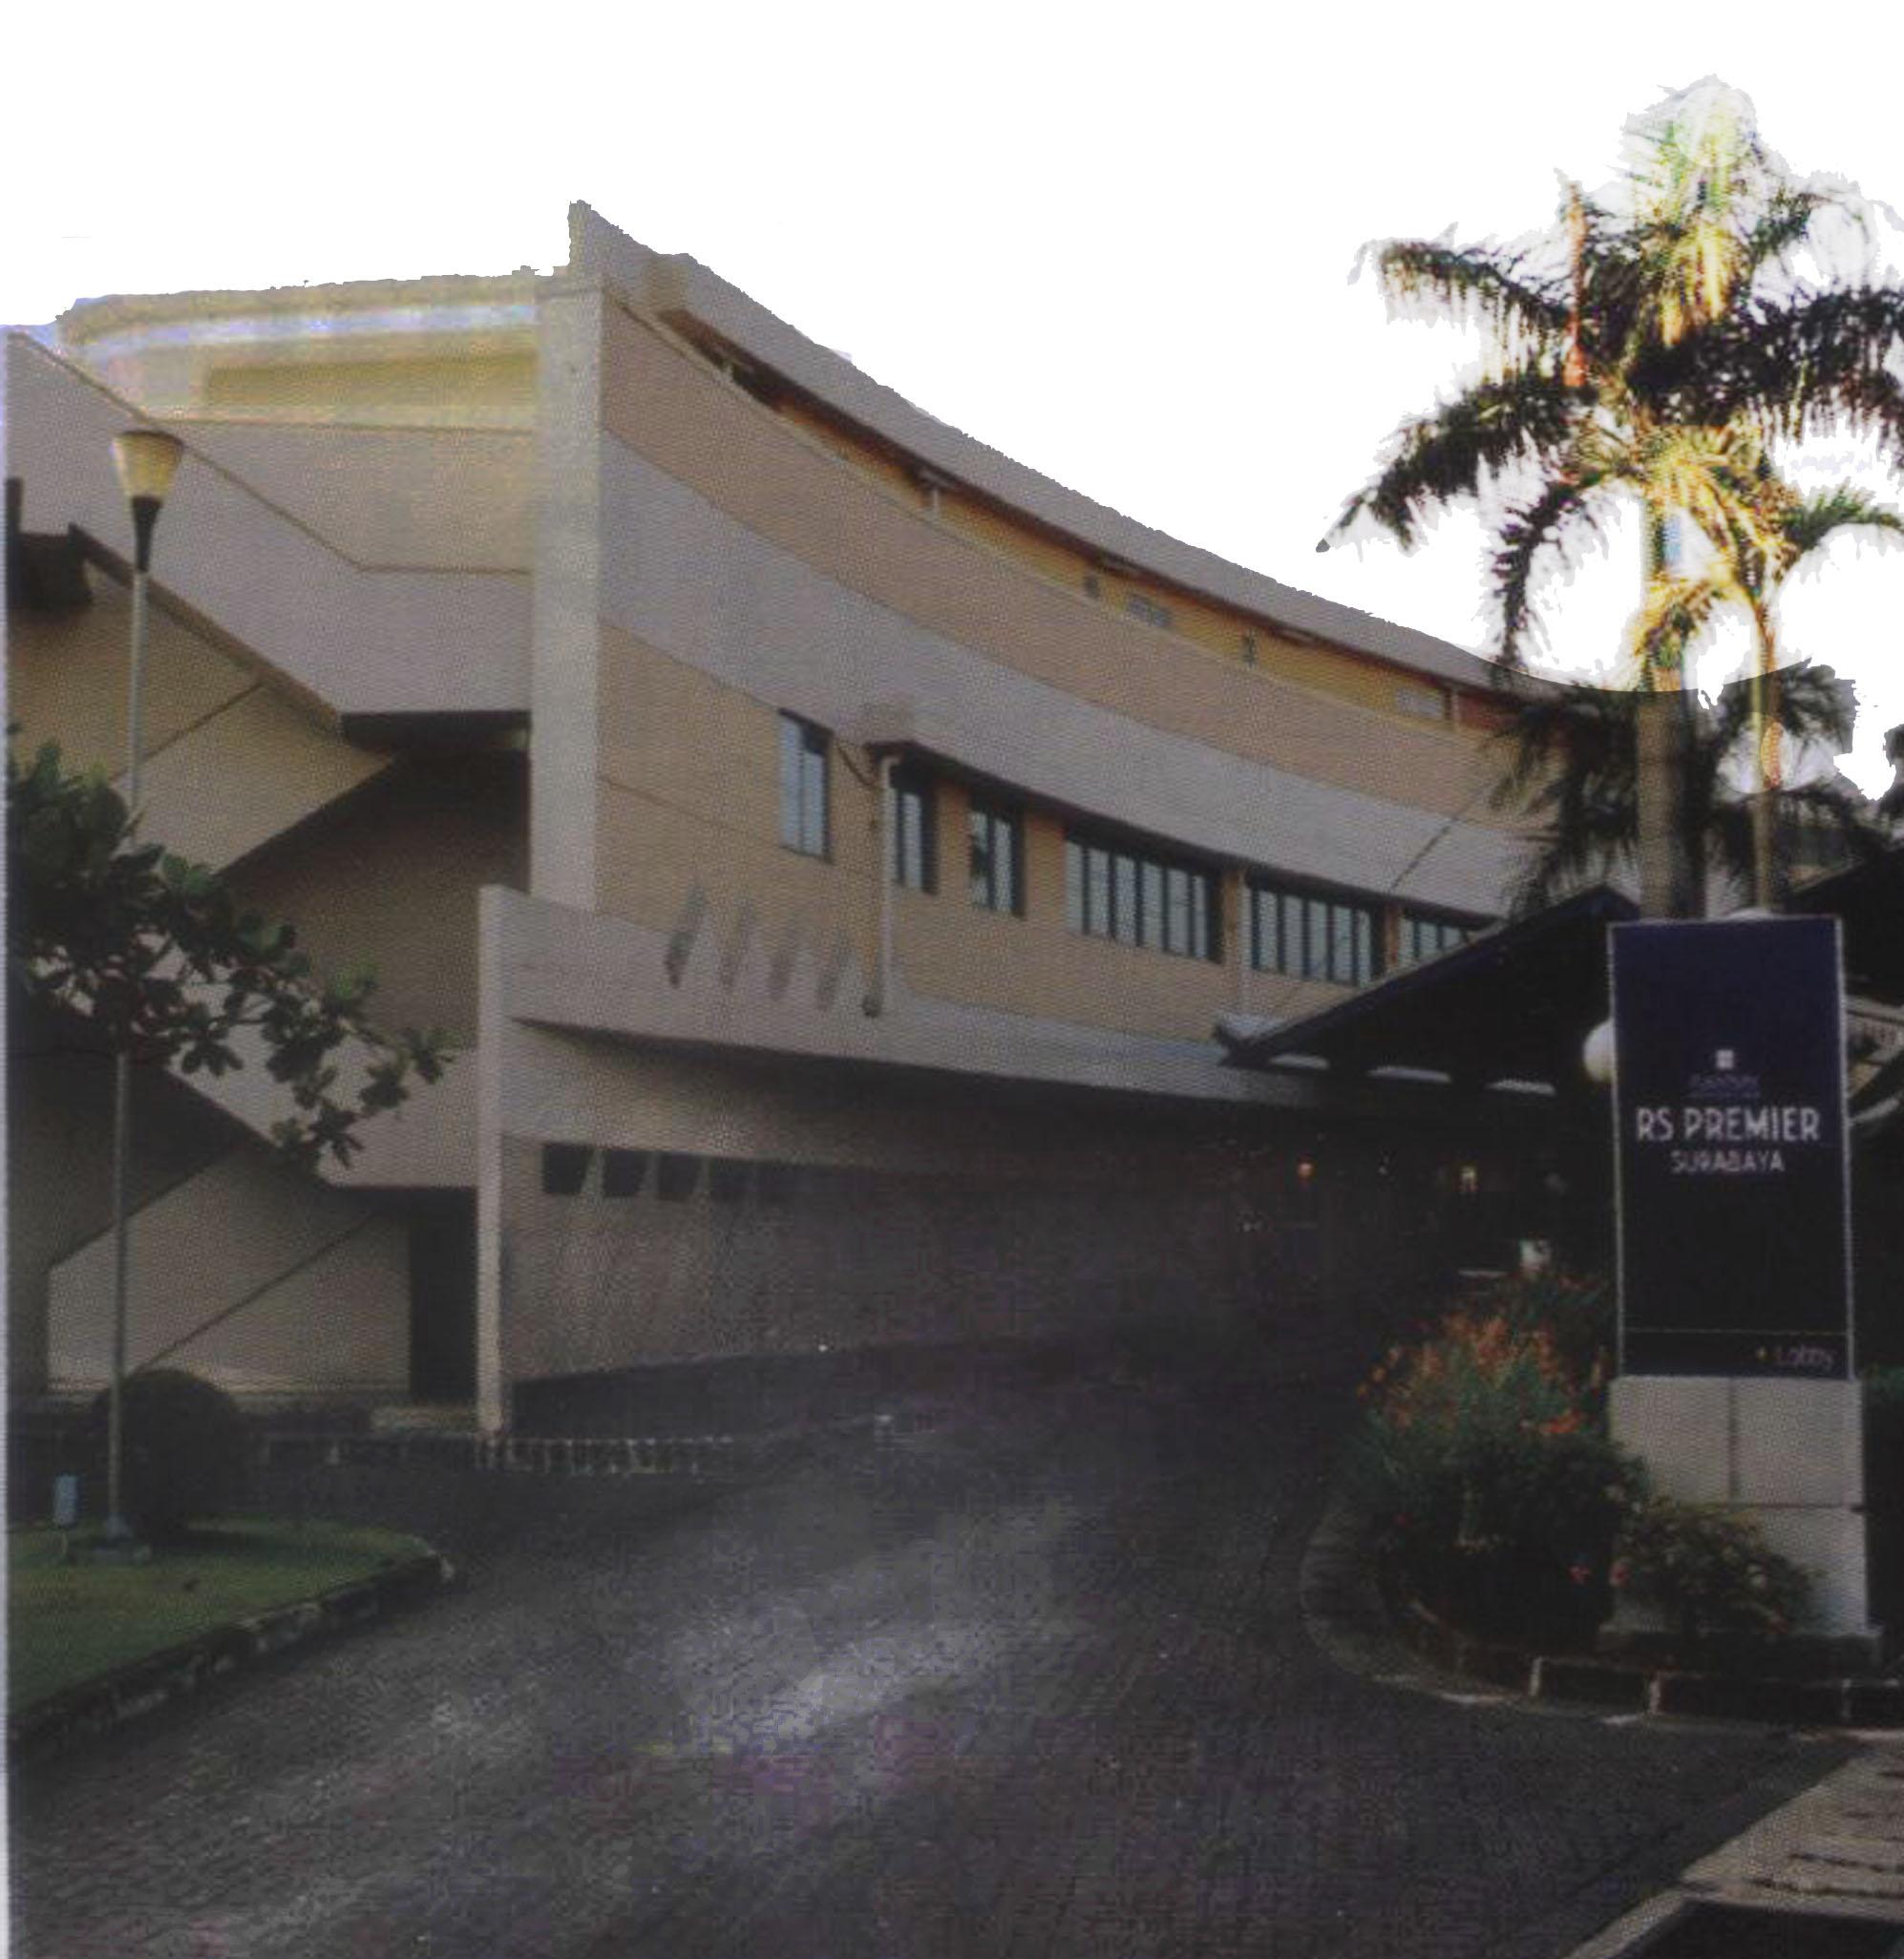 rumah sakit premier surabaya pusaka jawatimuran rh jawatimuran wordpress com